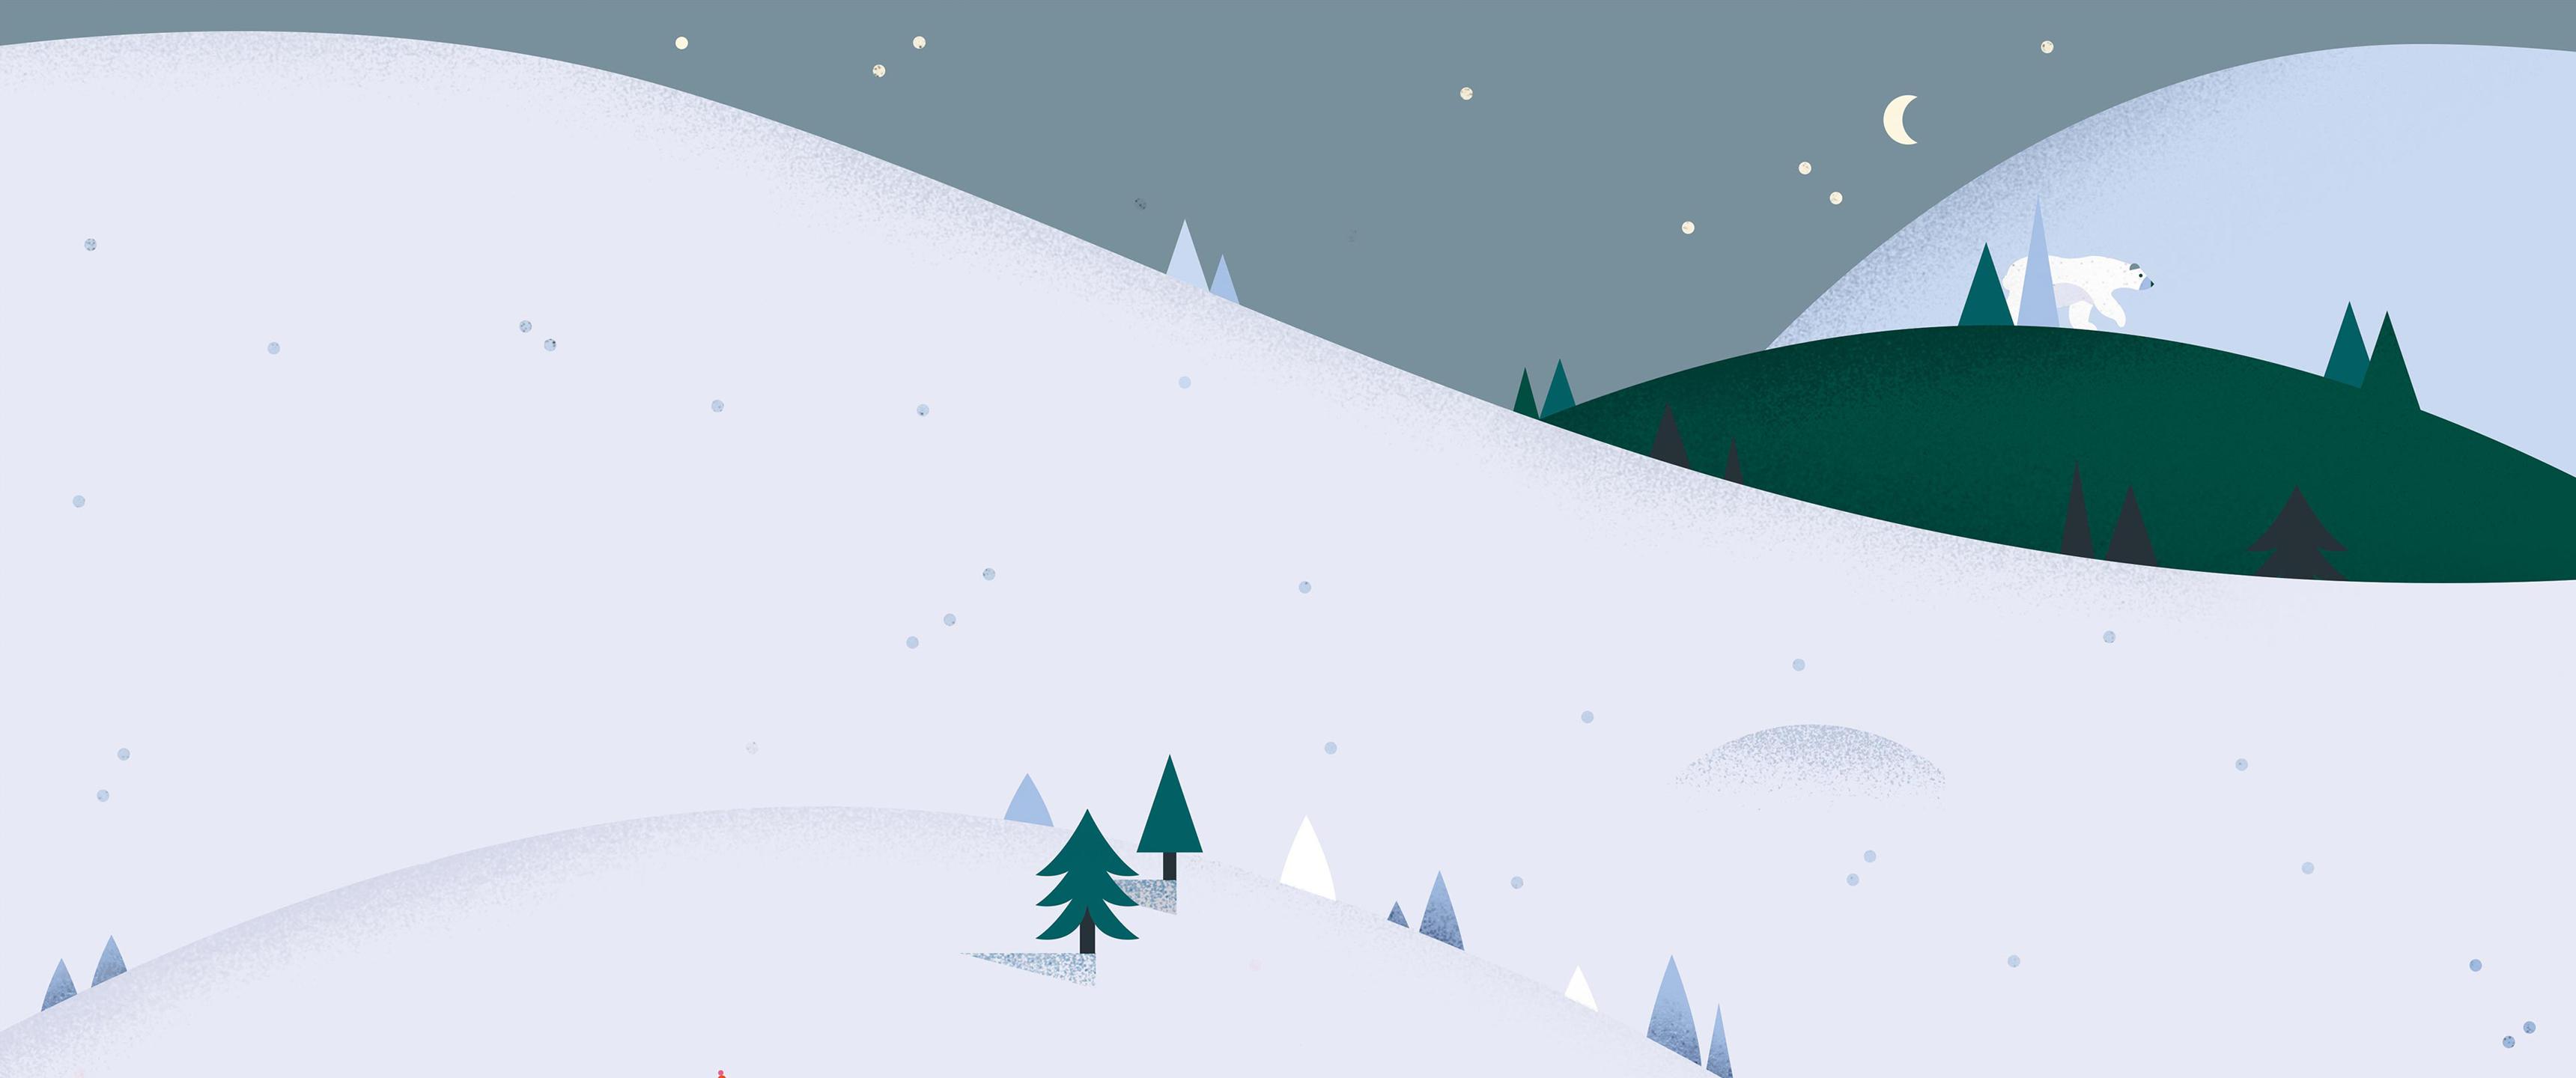 Wallpaper illustration night minimalism snow hills